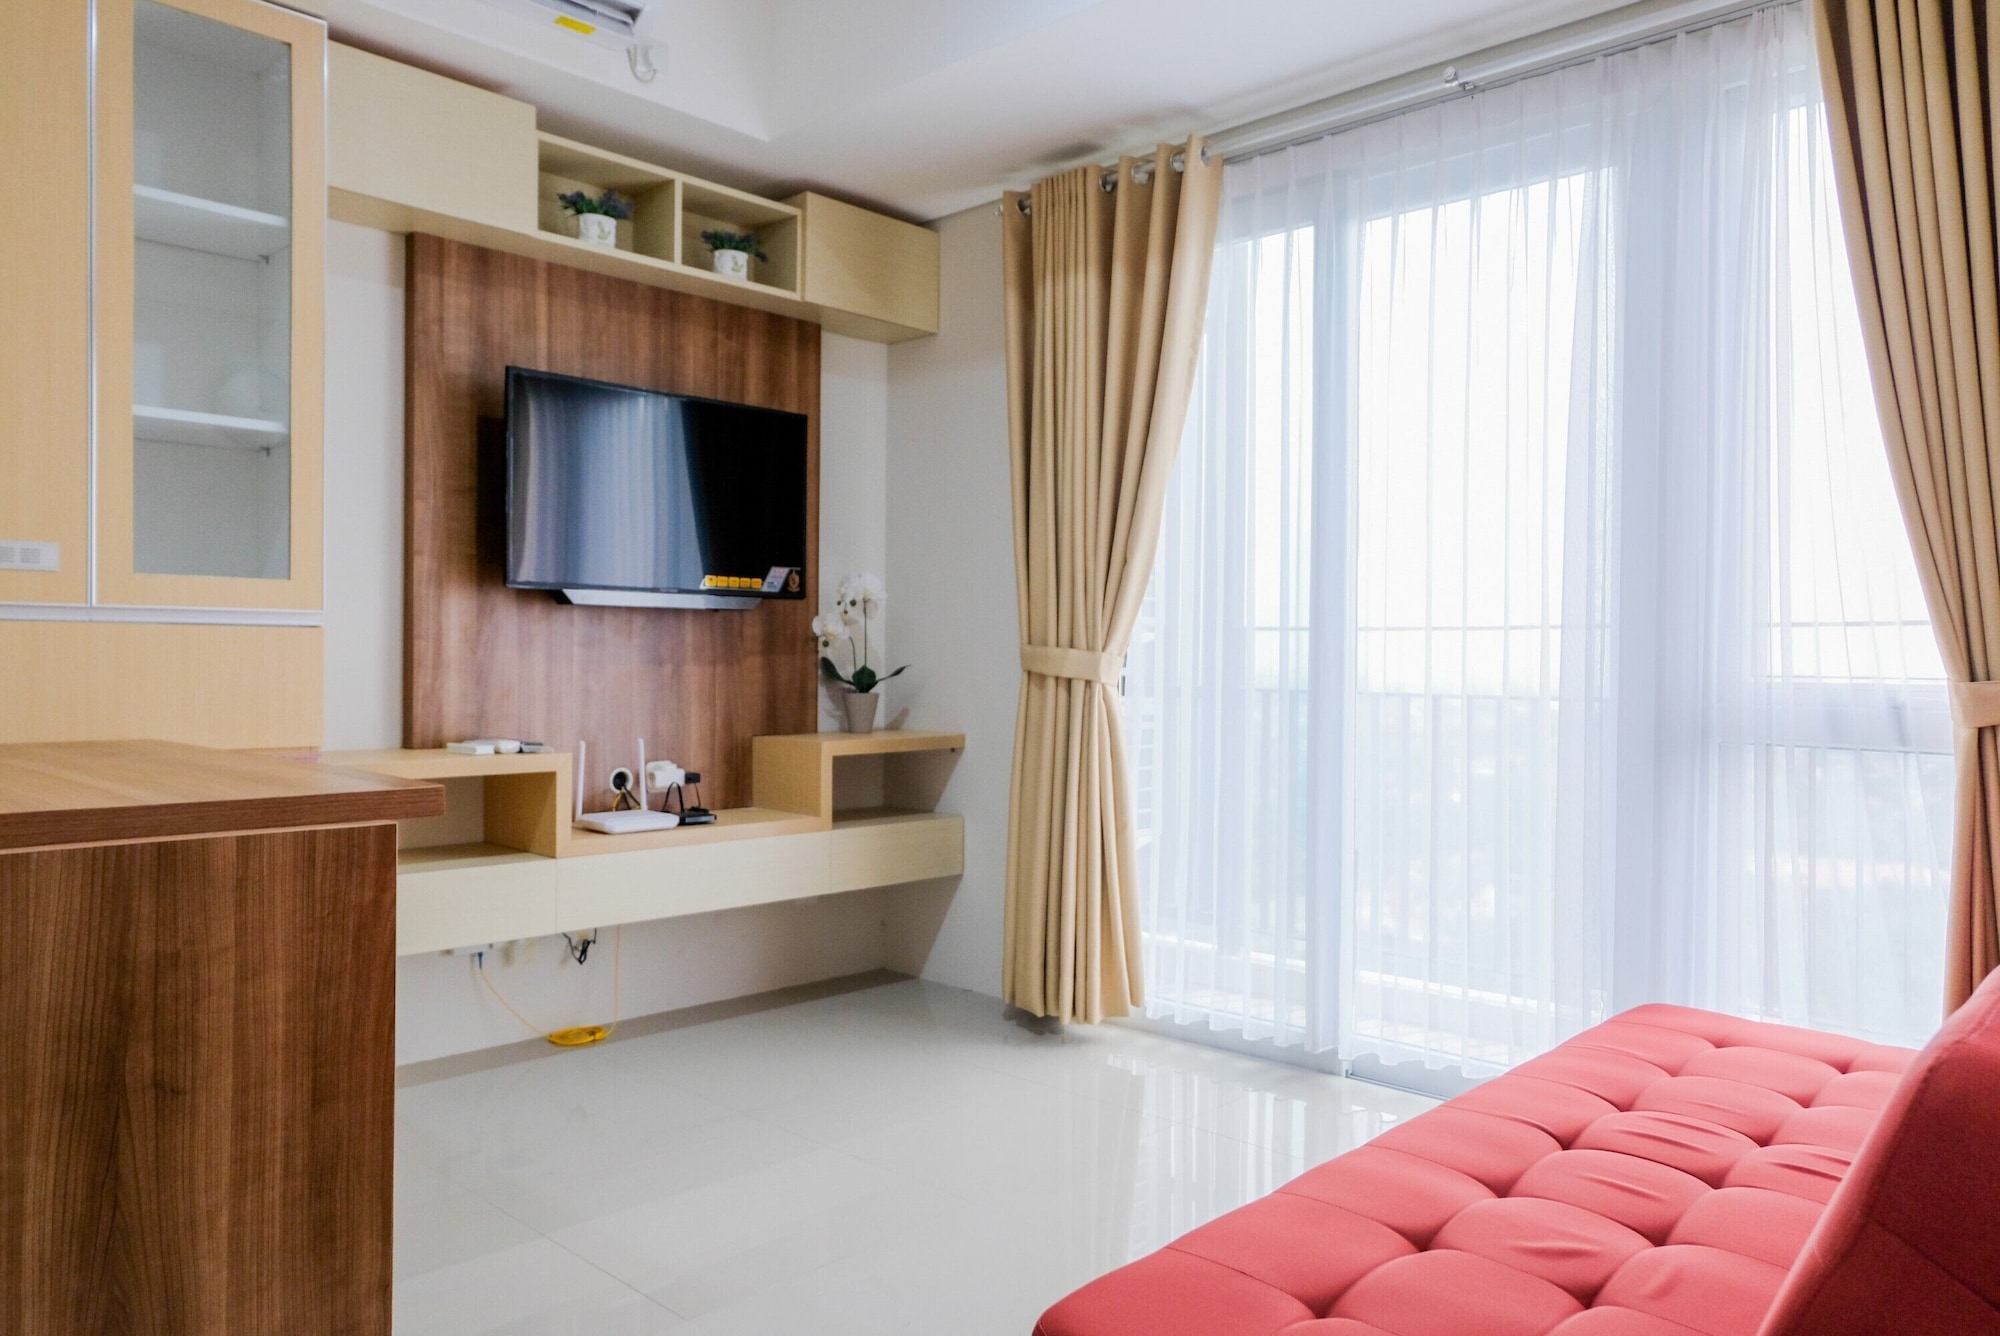 Best Price 2BR Apartment at Breeze Bintaro Plaza Residences, Tangerang Selatan